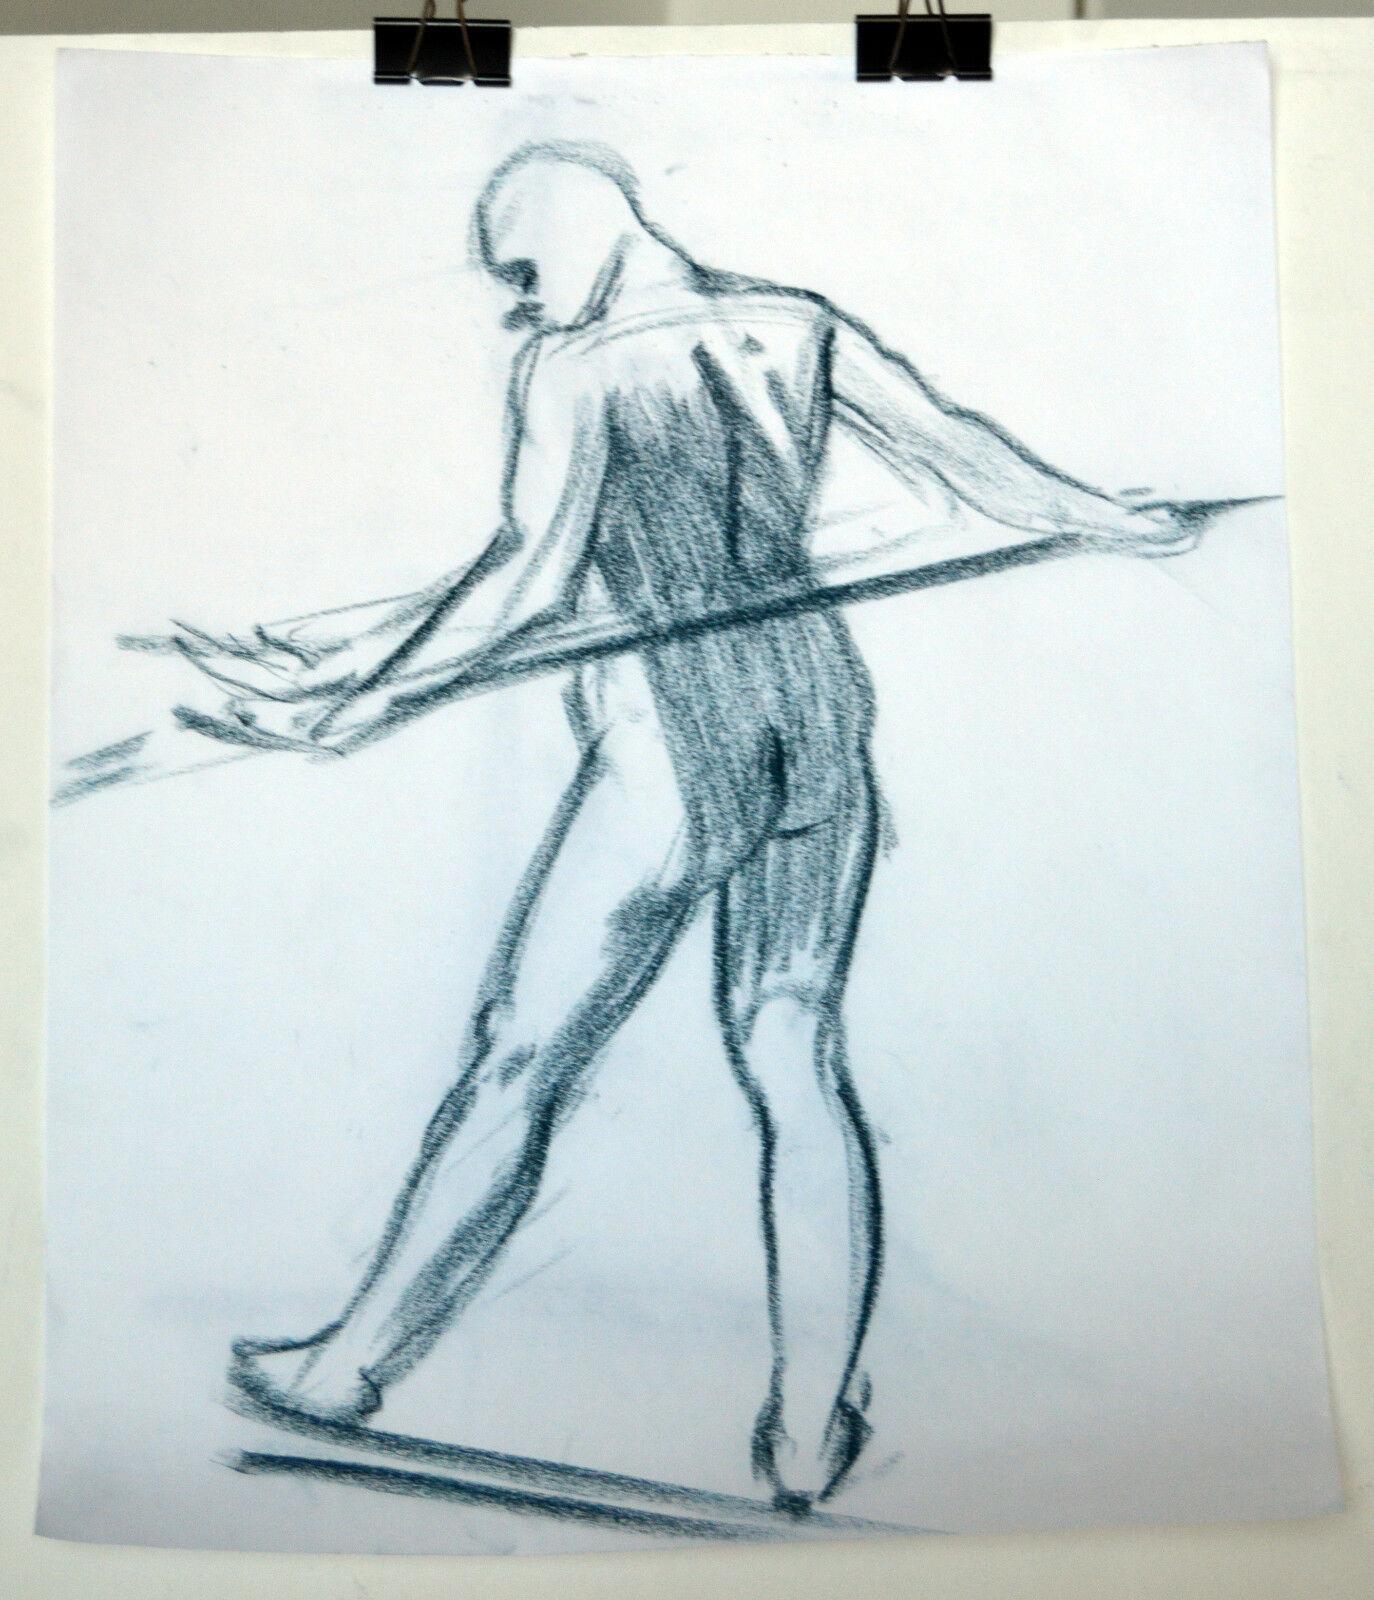 "17"" Vintage Drawing Pastels Sketch Nude Man Stretching II Body Naked Pose"